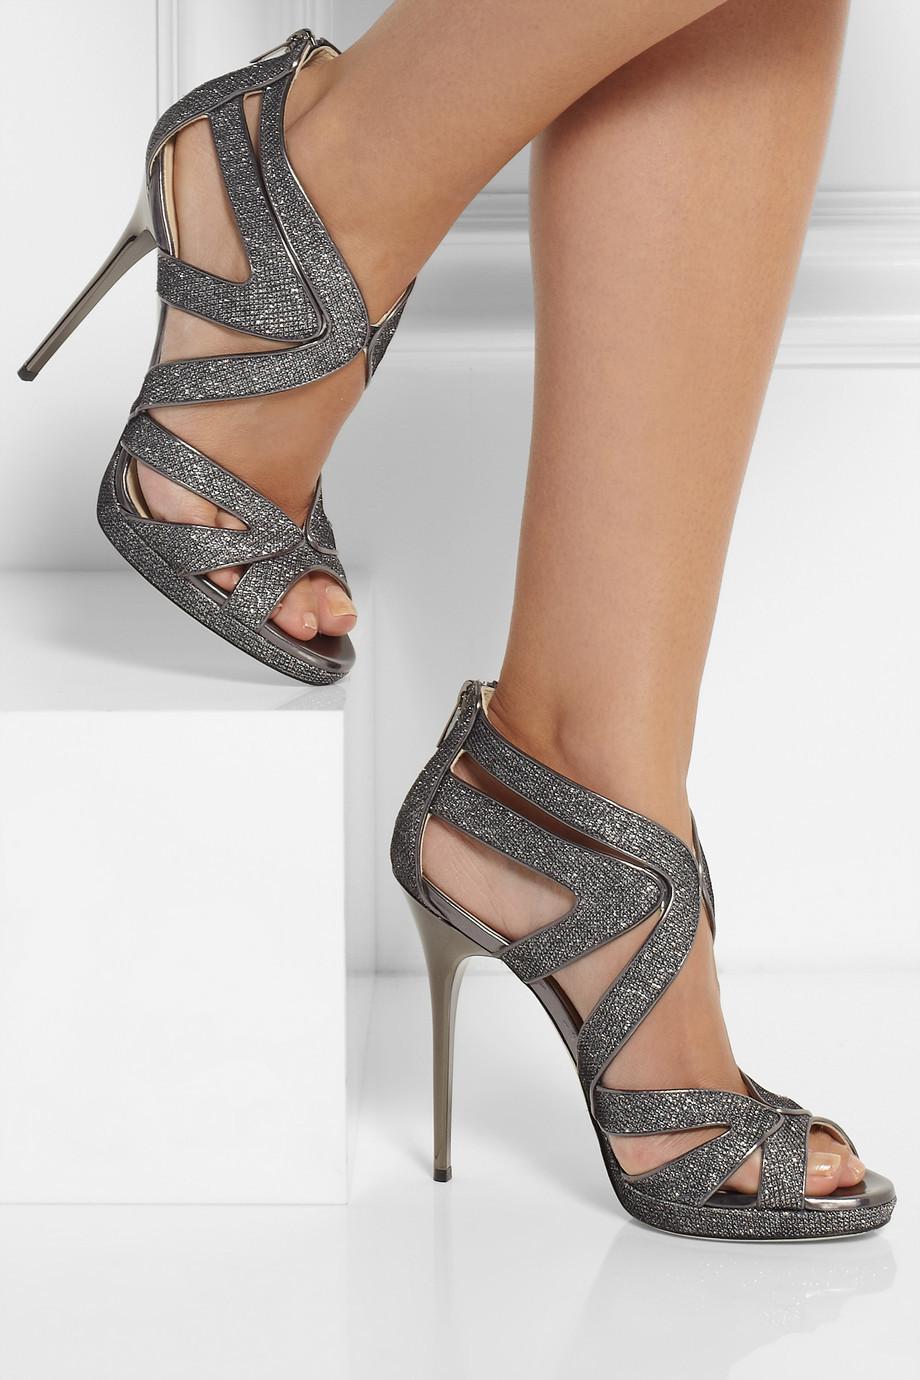 gris zapatos plomo zapatos gris plomo fiesta qUHtpWwn 1c0d090adca55